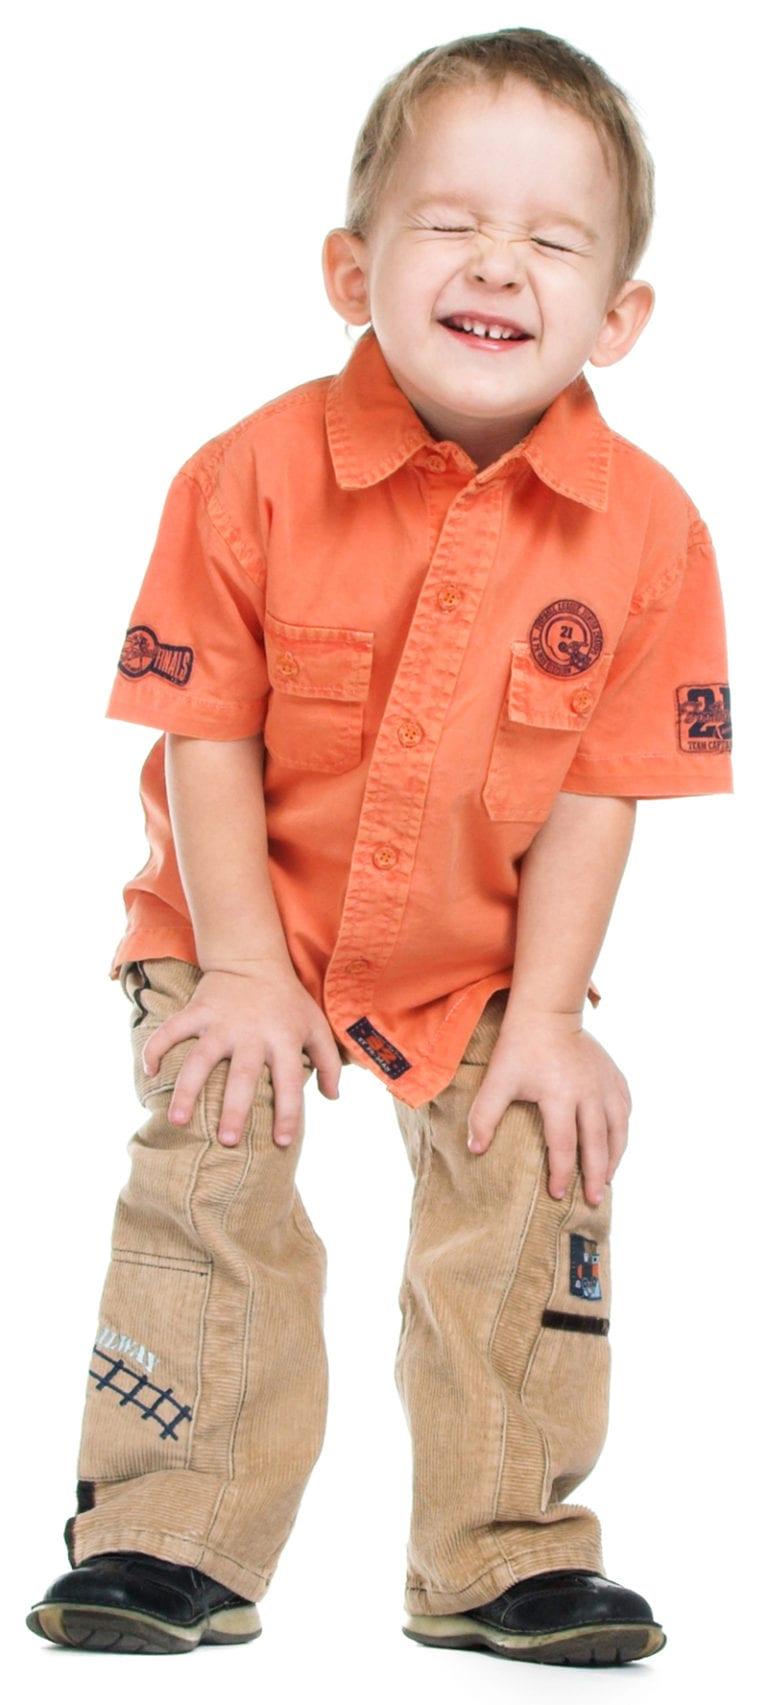 boy laughing at preschool